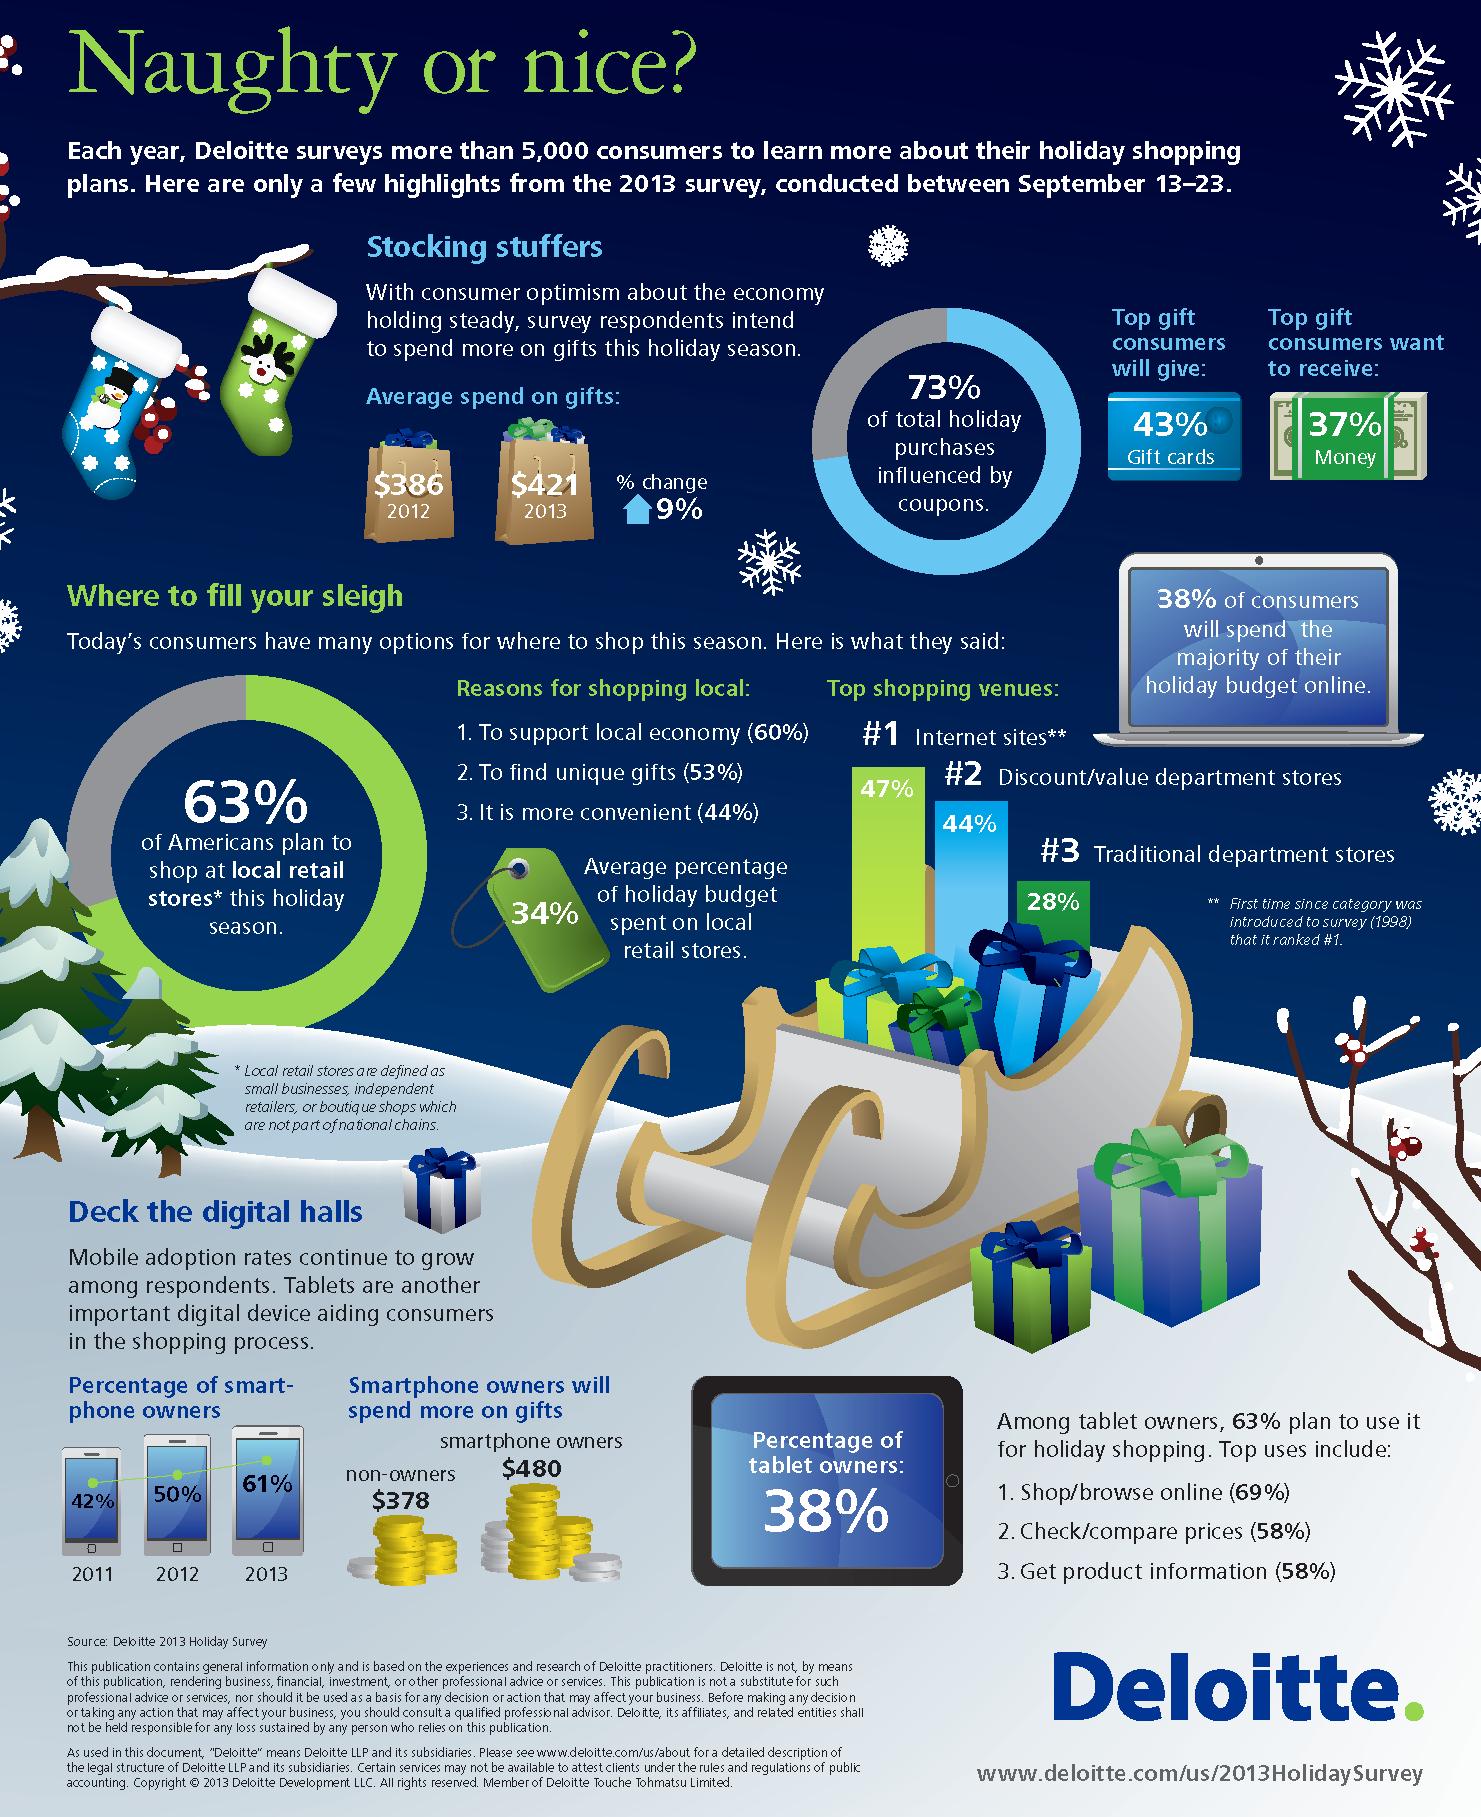 us_retail_2013_deloitte_infographic